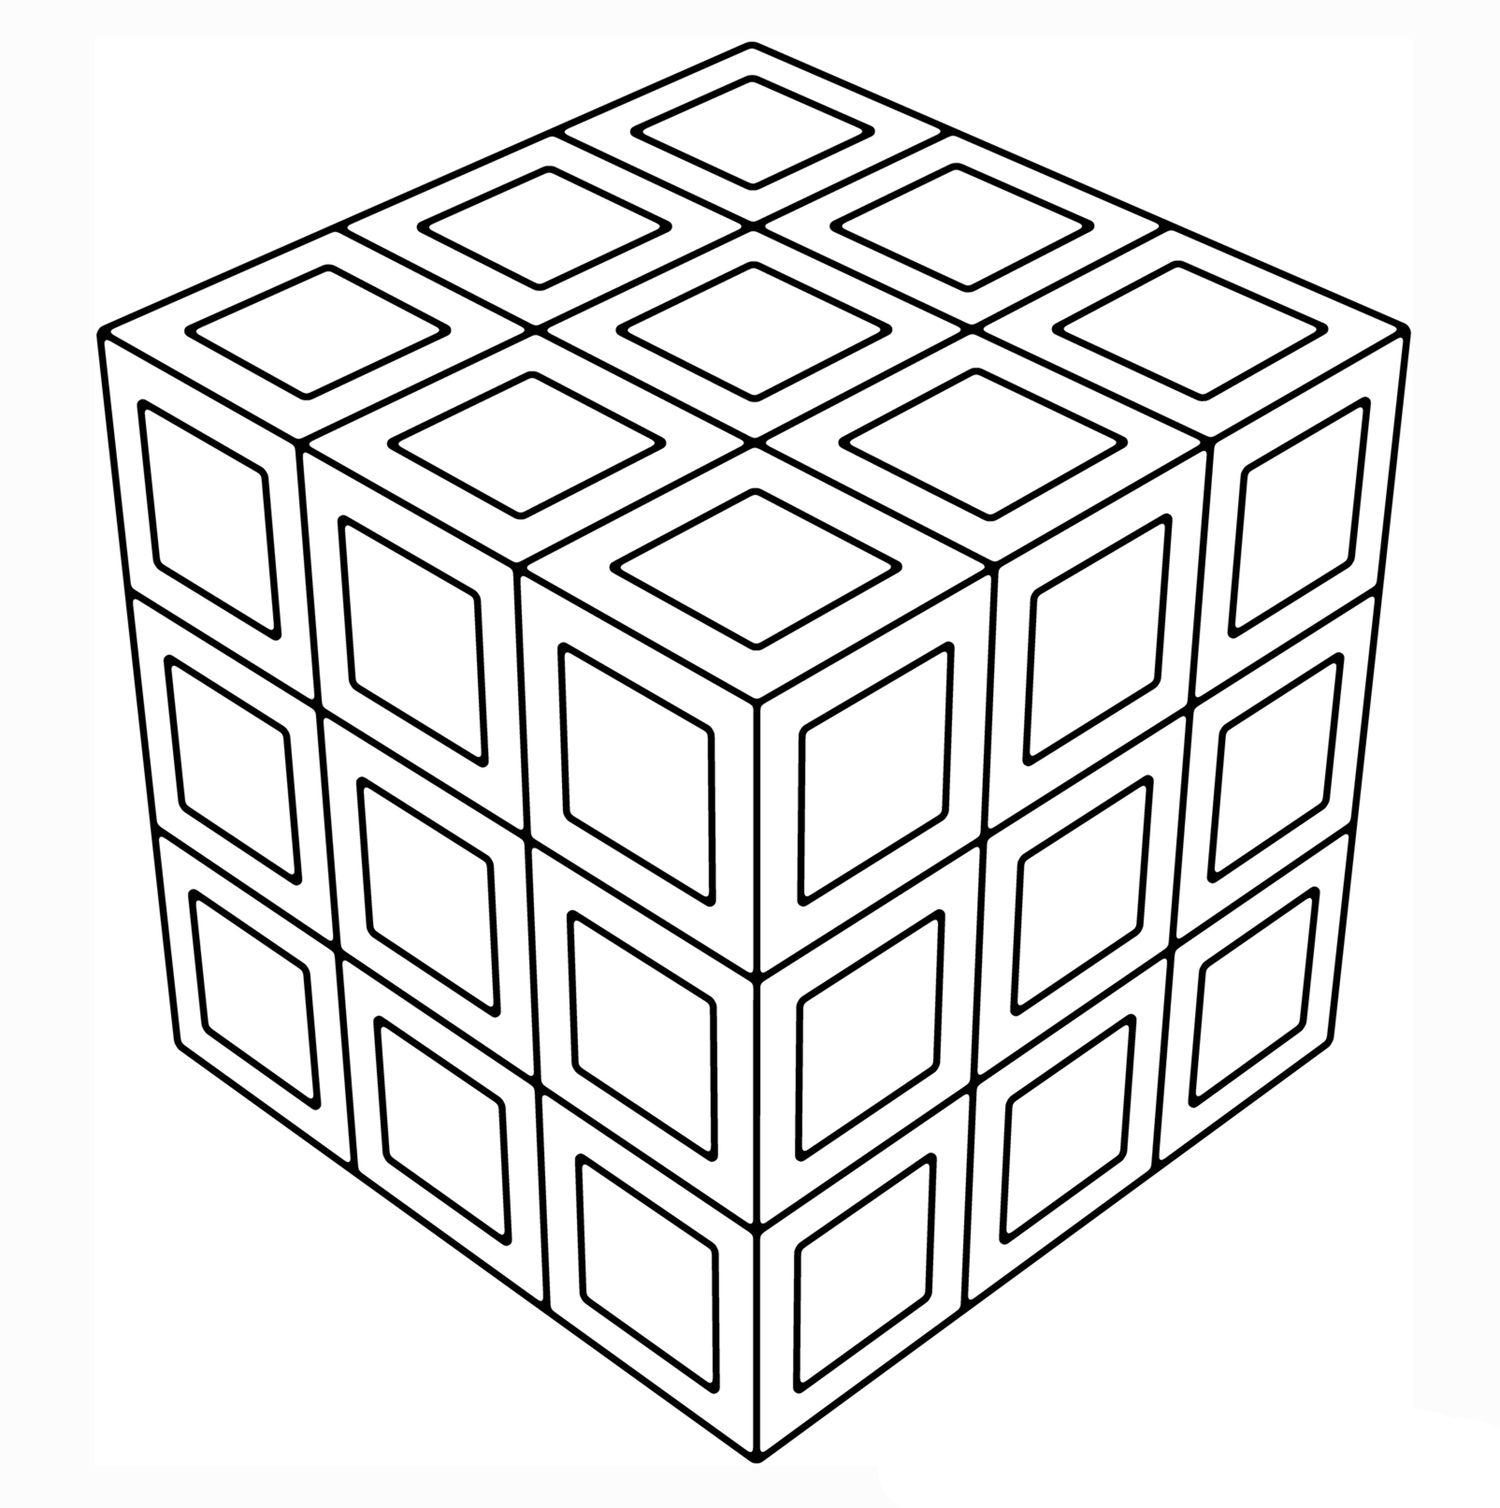 Cubatrongeometrycoloringpagesg dibujos pinterest